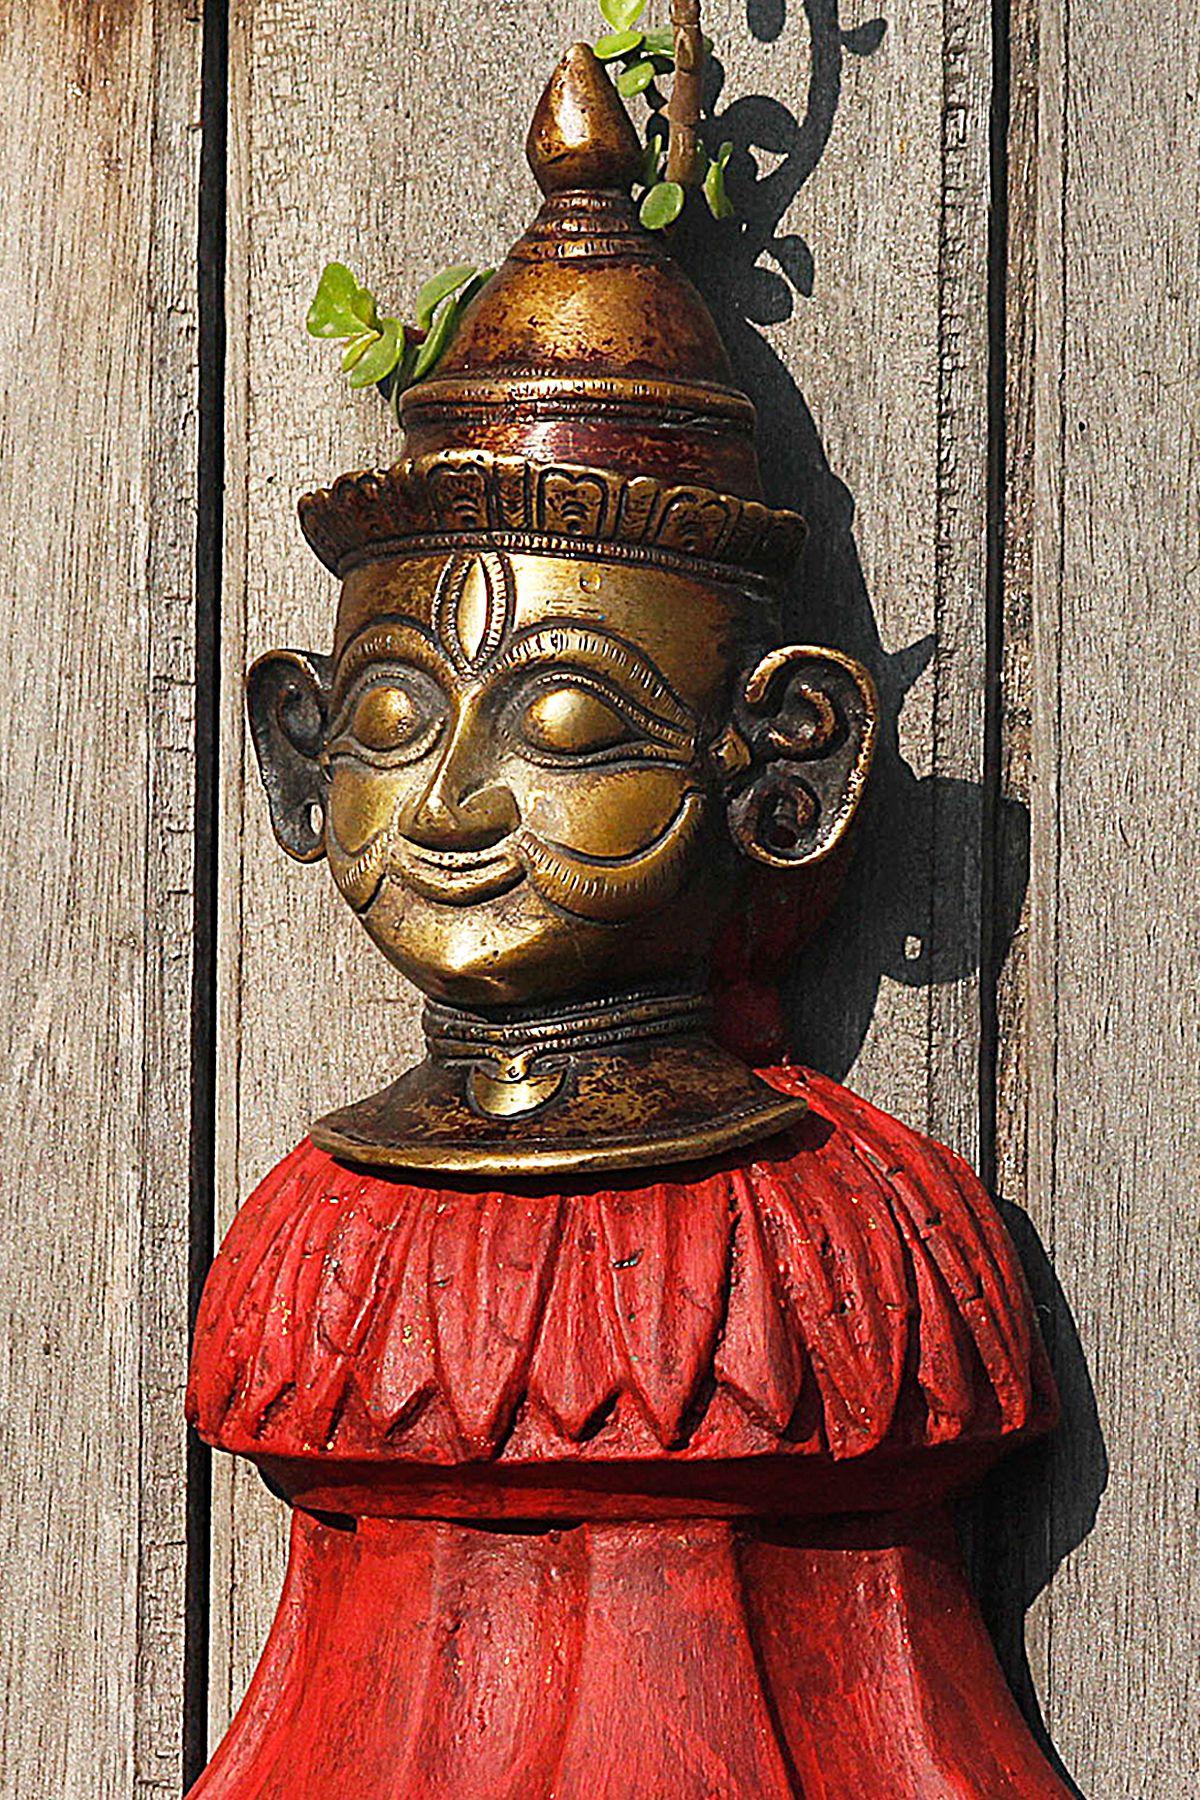 Brass Mukhalinga Theme Antique Lord Shiva Head Tribal Hindu Ritual God